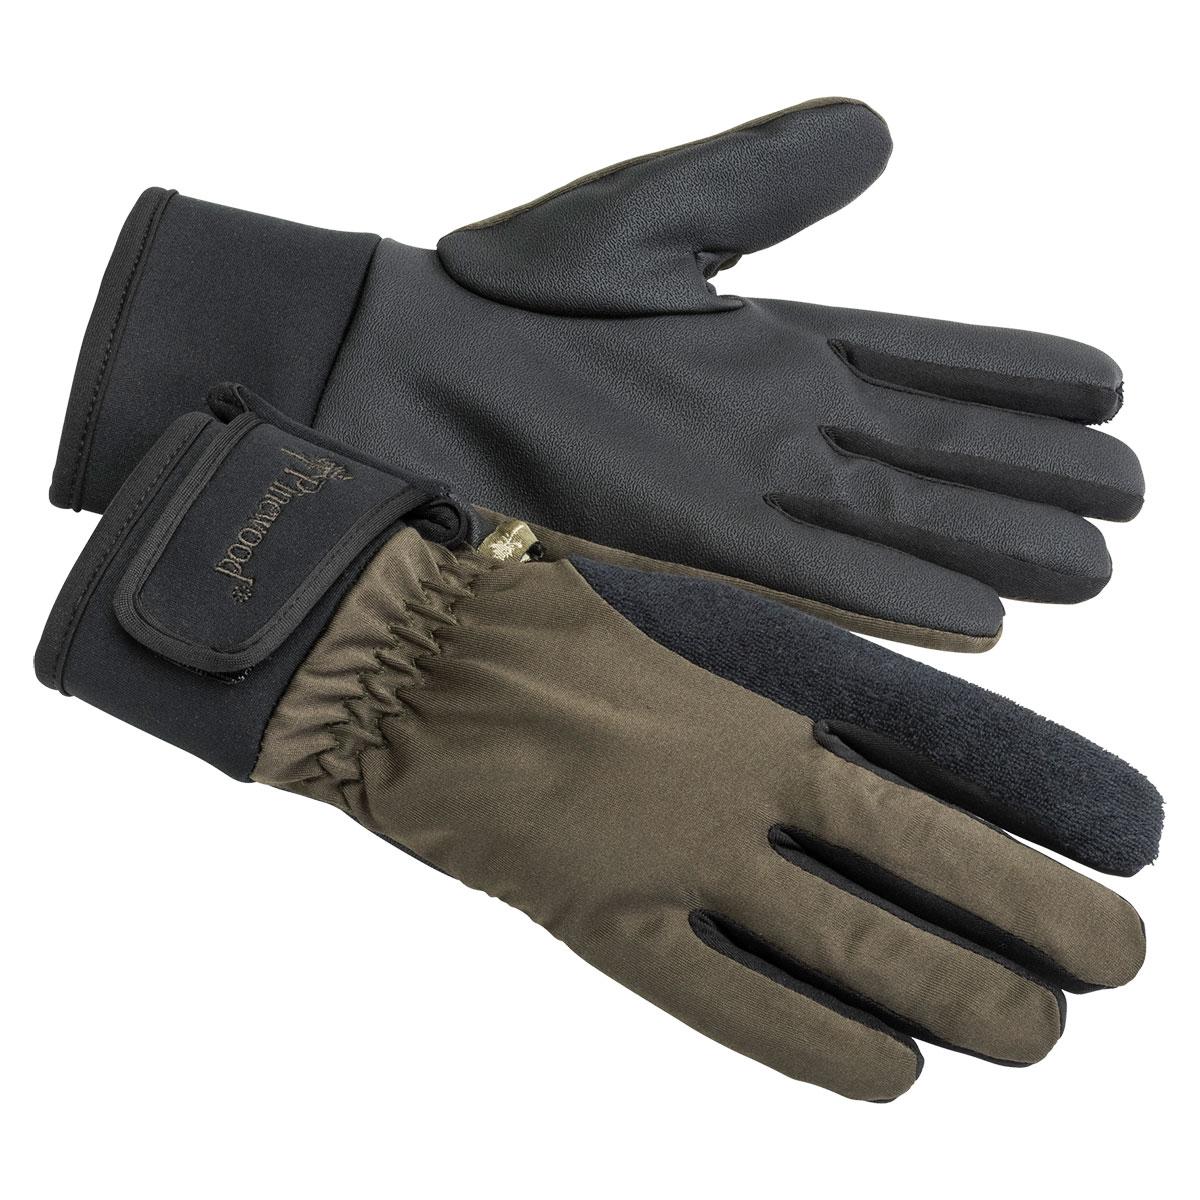 25657a7dddda Pinewood Handschuhe Reswick Extreme Suede Braun - Pareyshop.de